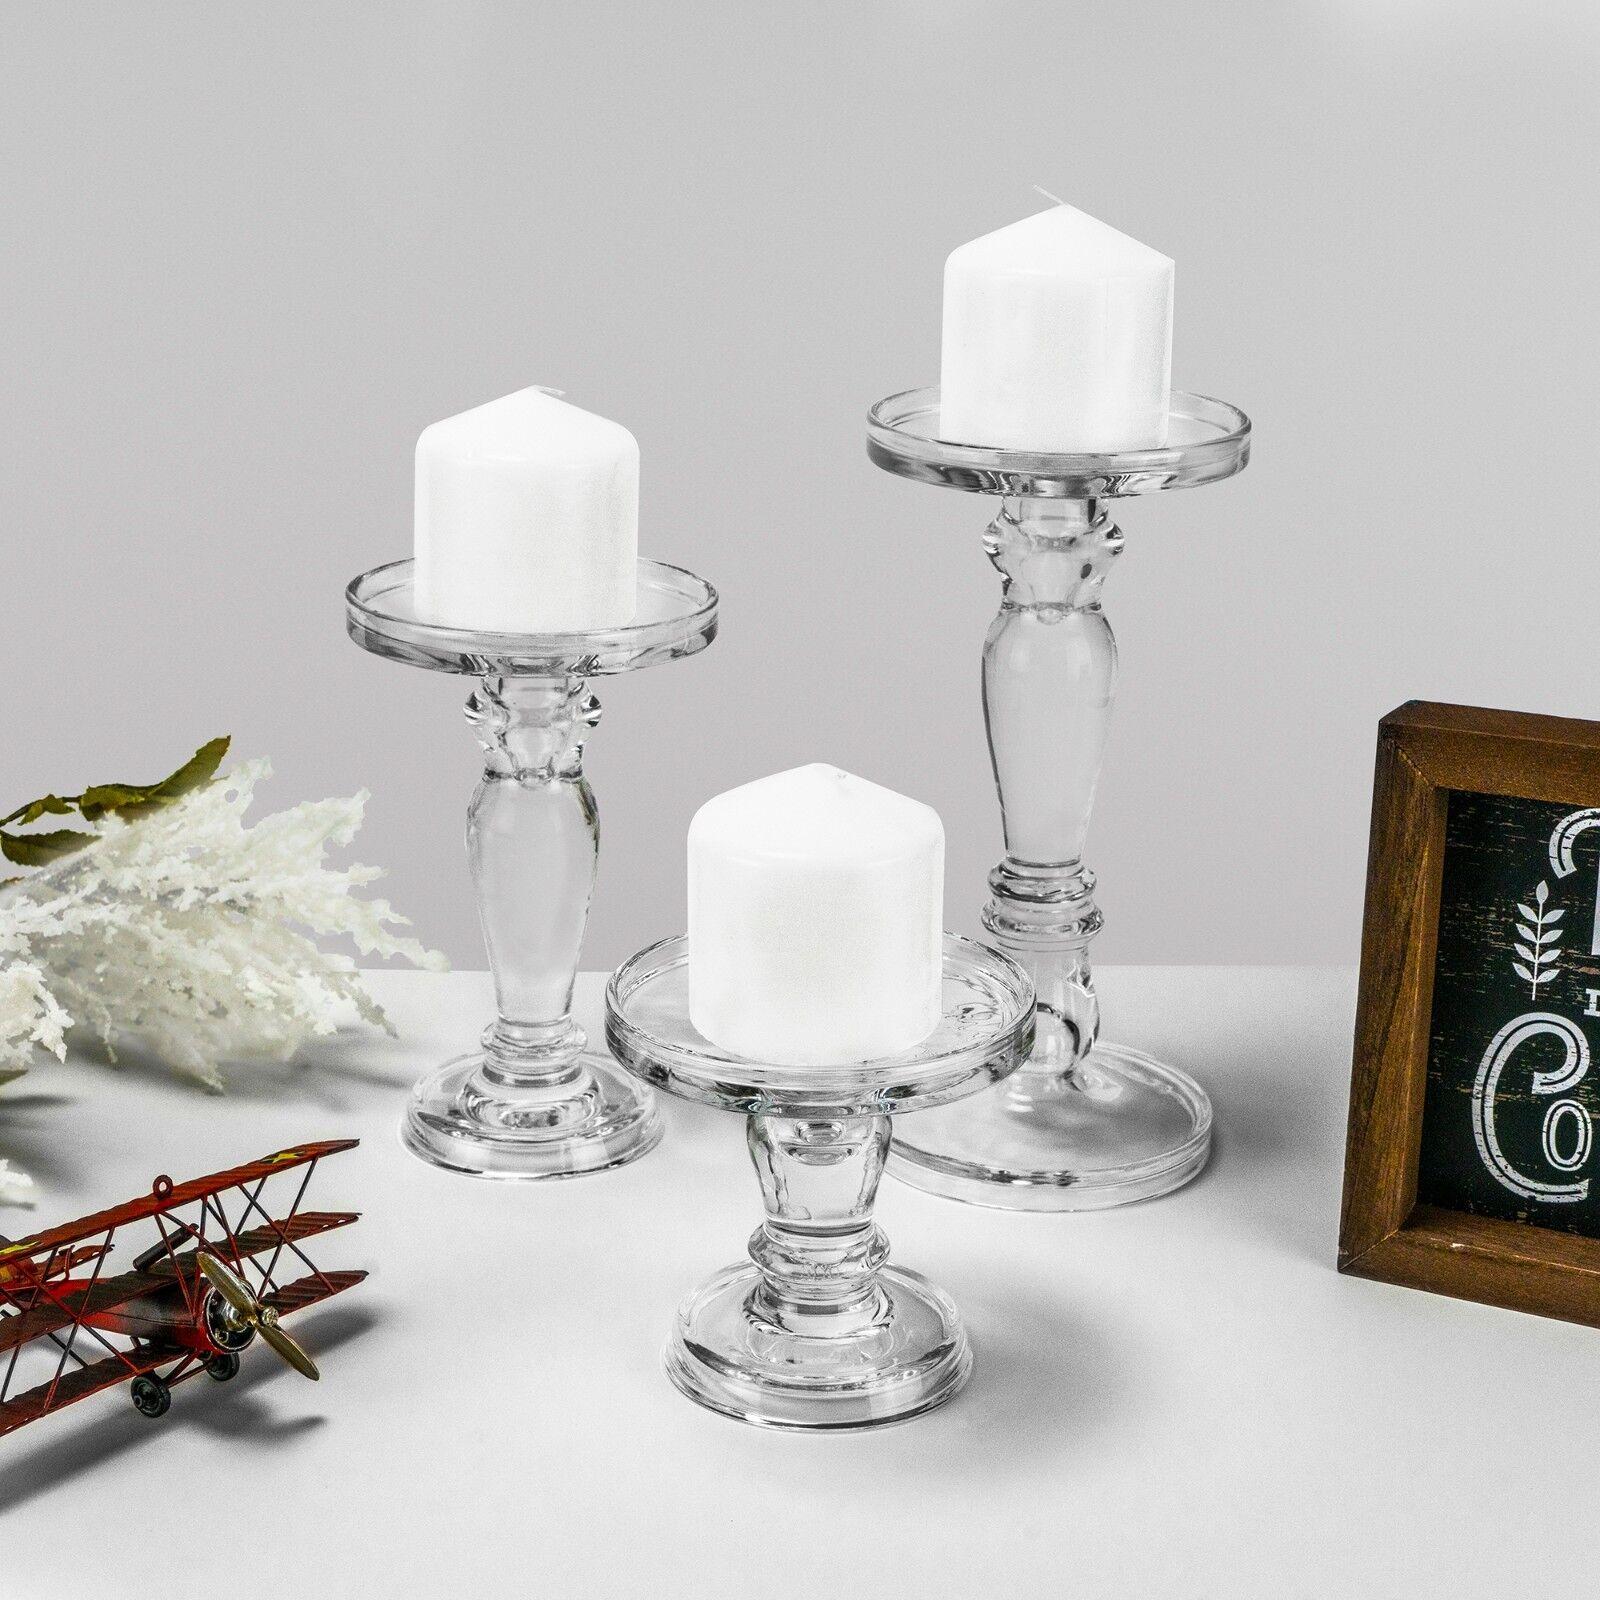 Glass Candle Holder Set Of 3 Pillar Holders Candlesticks Ste